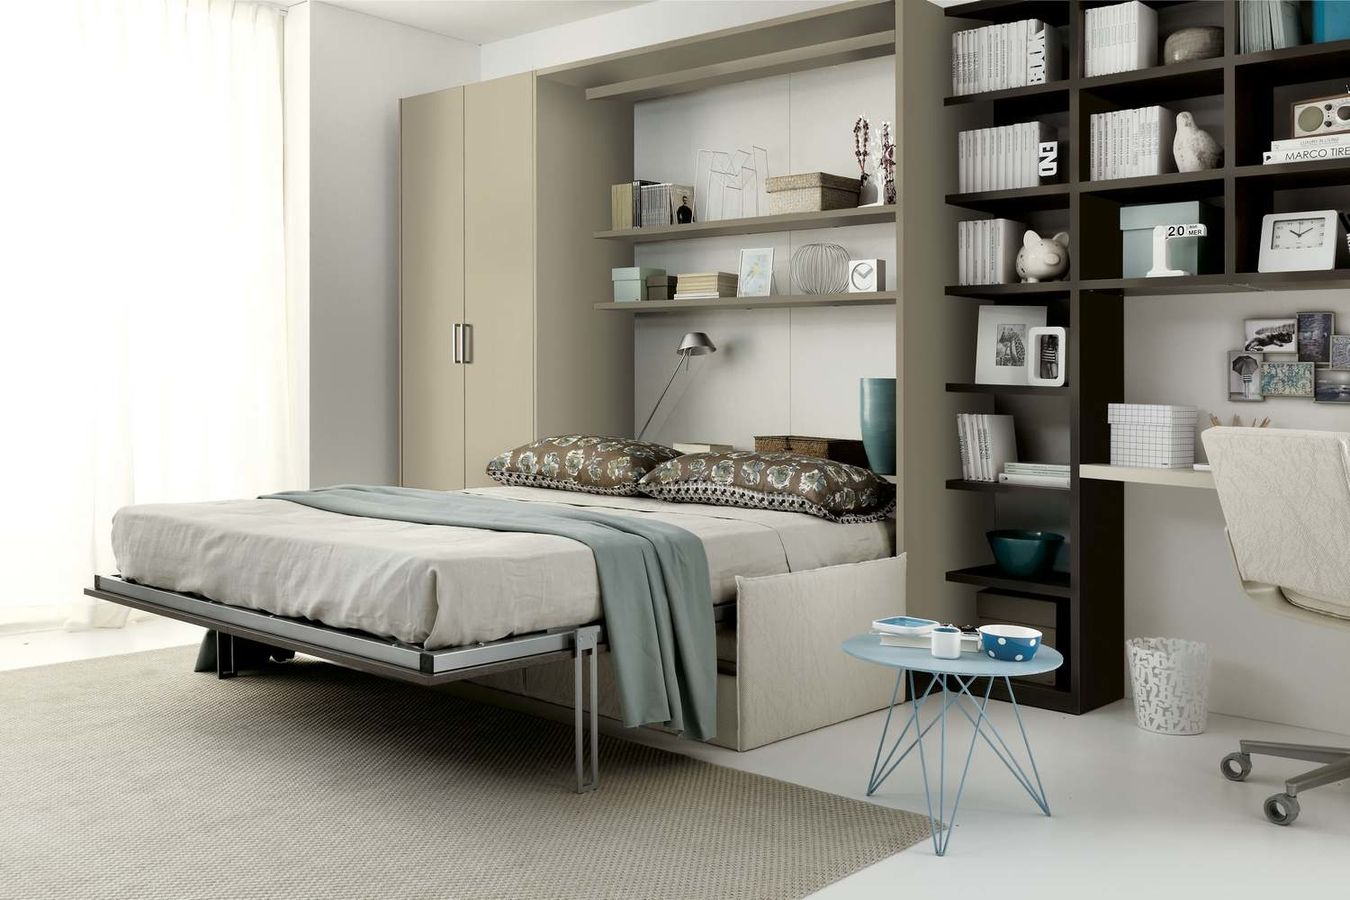 Wtu Children S Wall Bed 961 Milano Smart Living